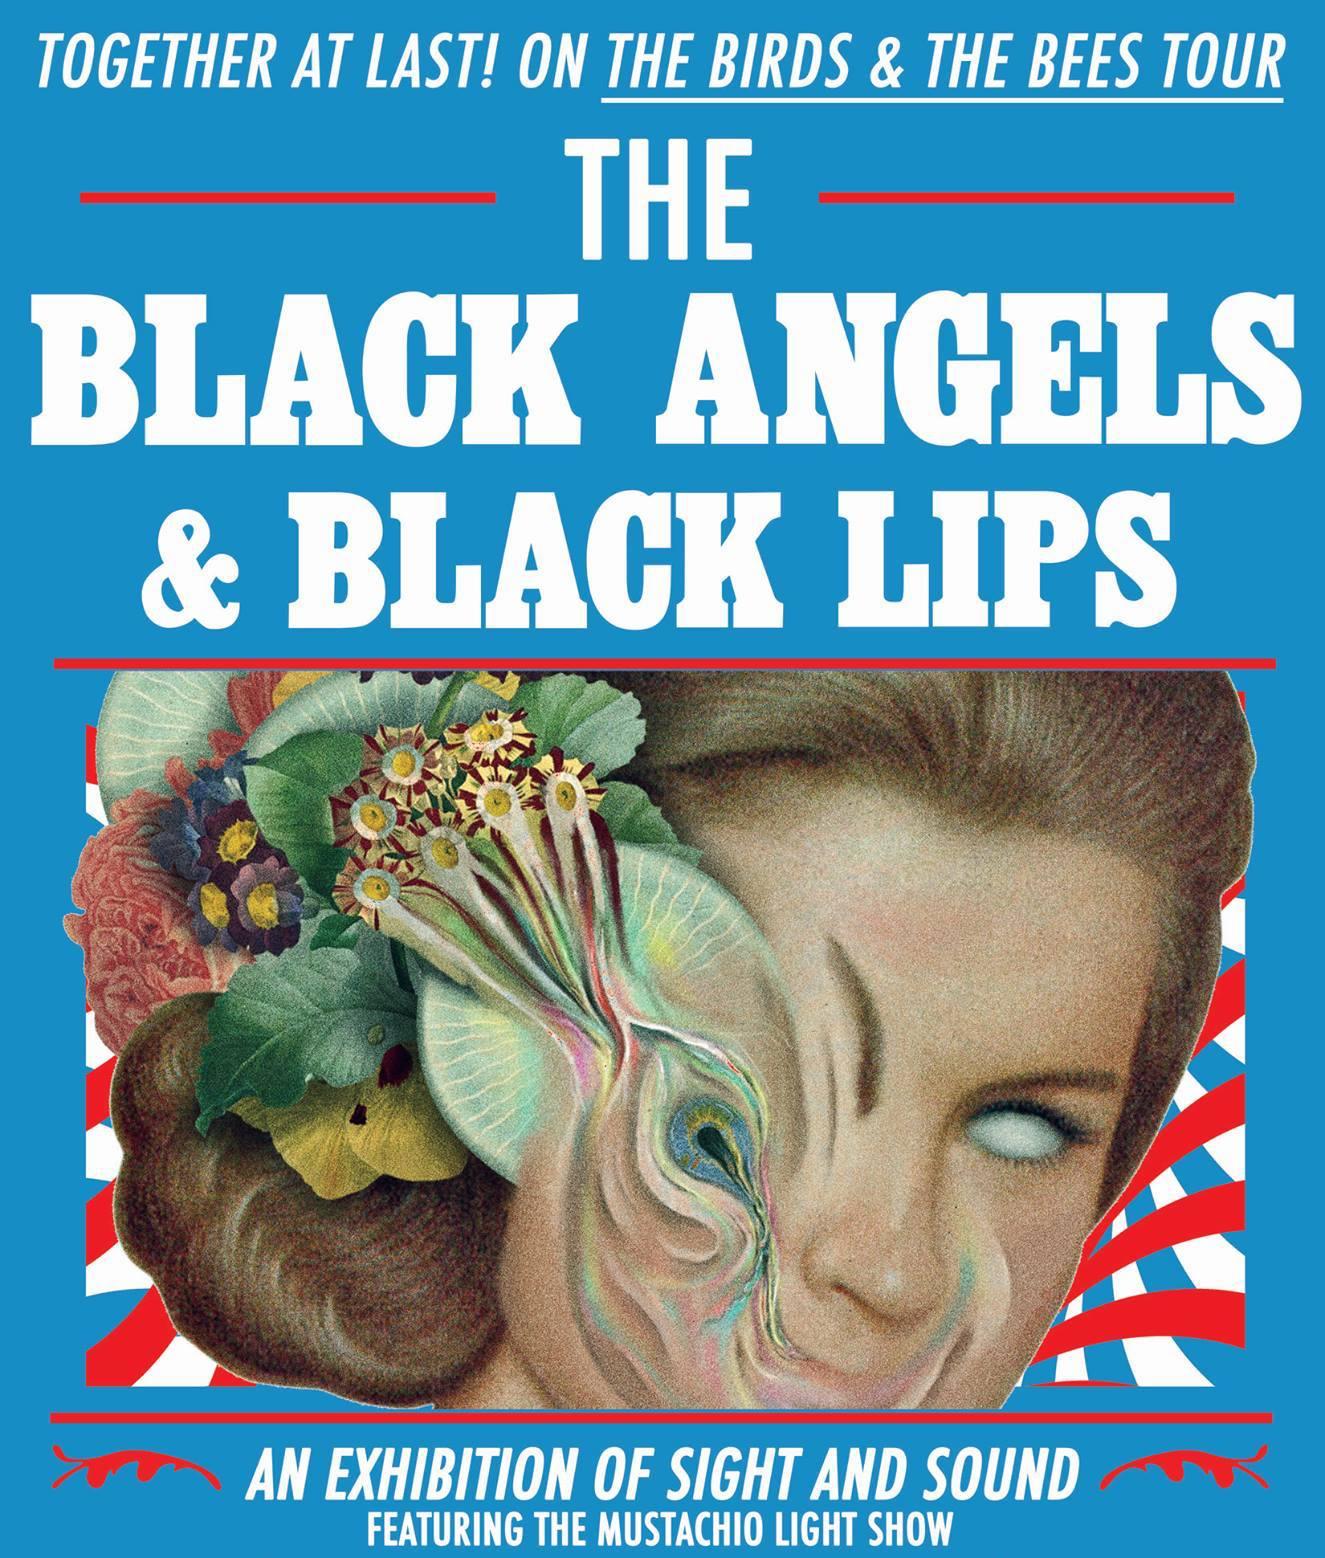 The Black Angels & The Black Lips touring together this spring https://t.co/PkrzgrXBDO https://t.co/CPk95NKvsb